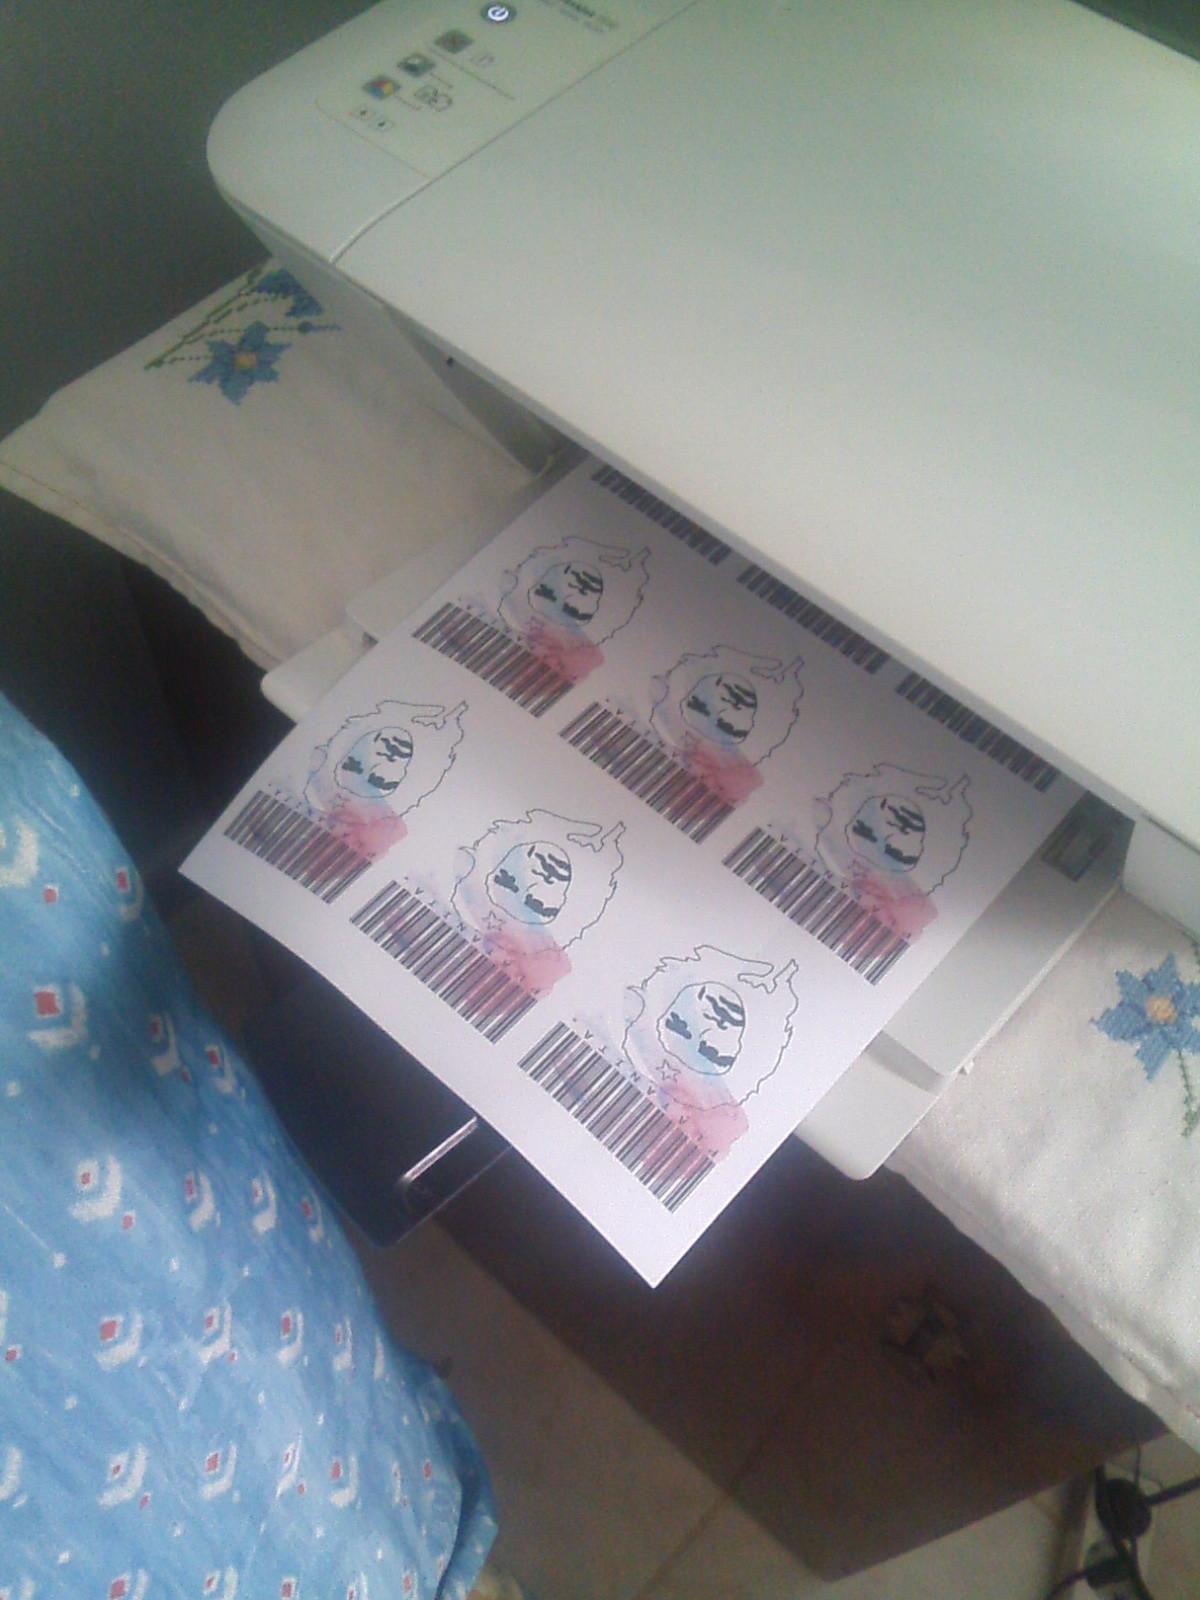 stickers-hechas-casa-25f0d8a8f76d26152a8